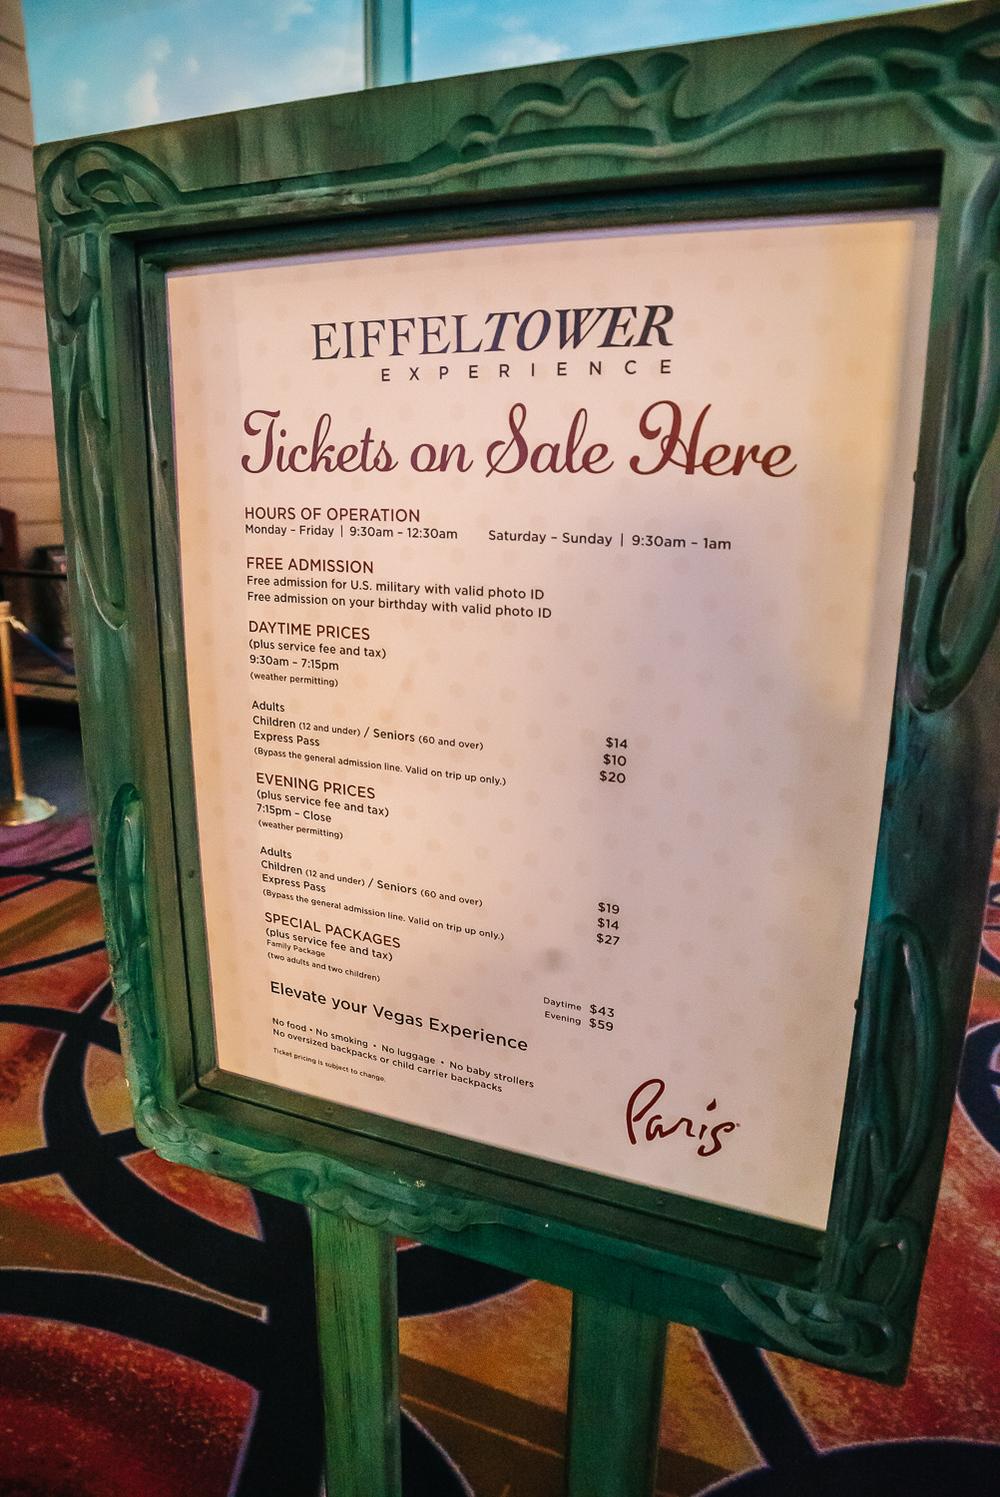 Eiffel Tower Experience www.thetravelpockets.com